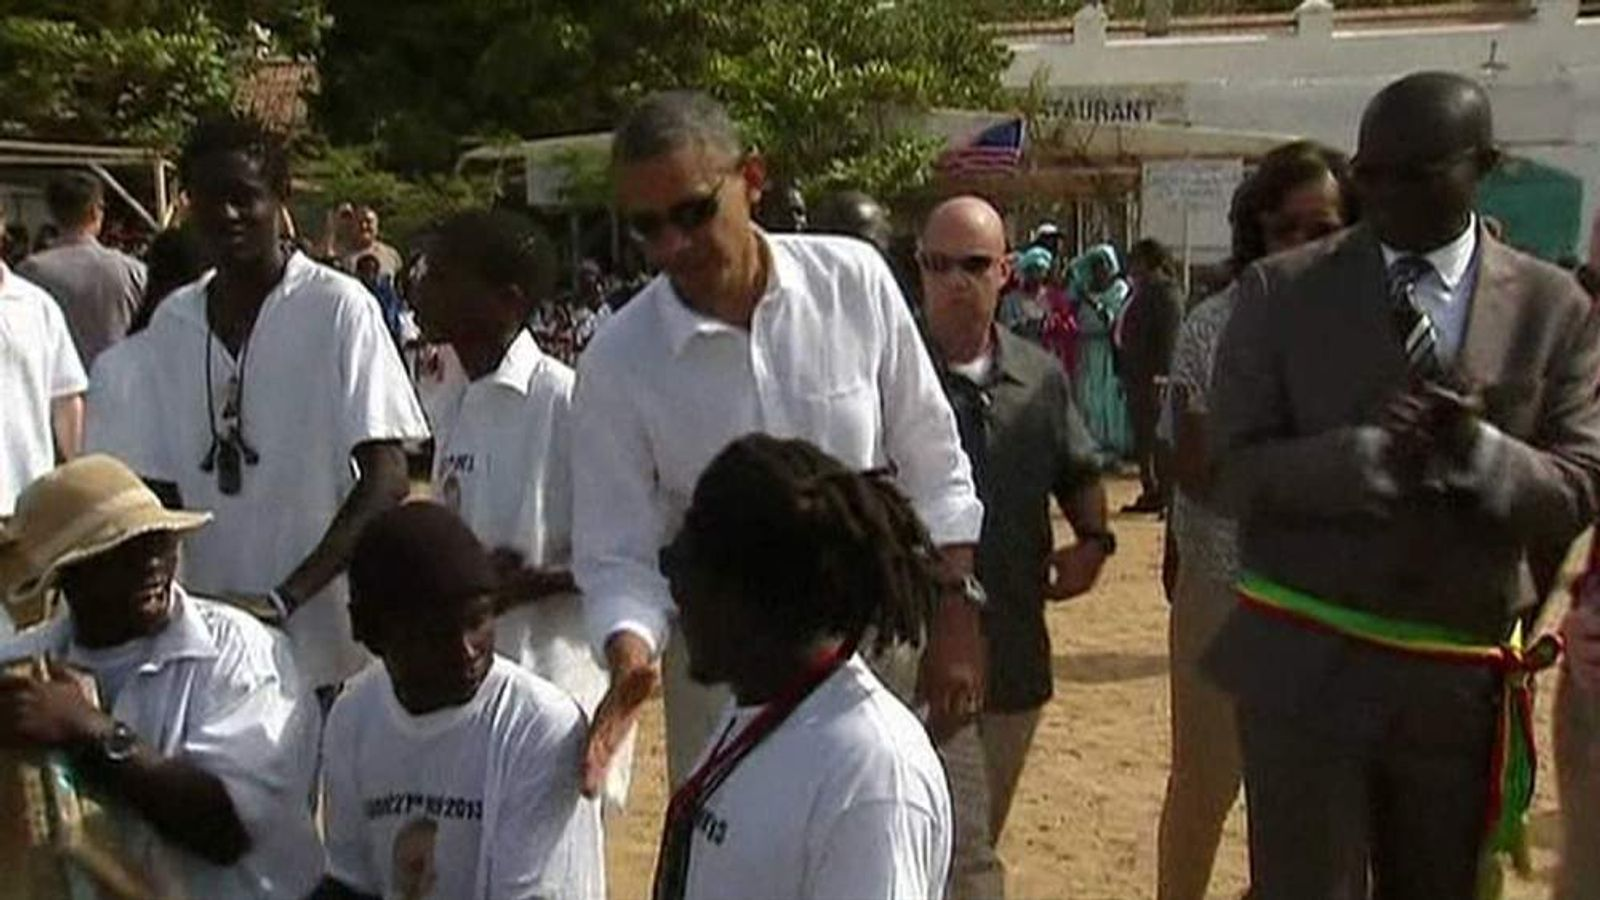 President Obama meets locals during visit to Senegal